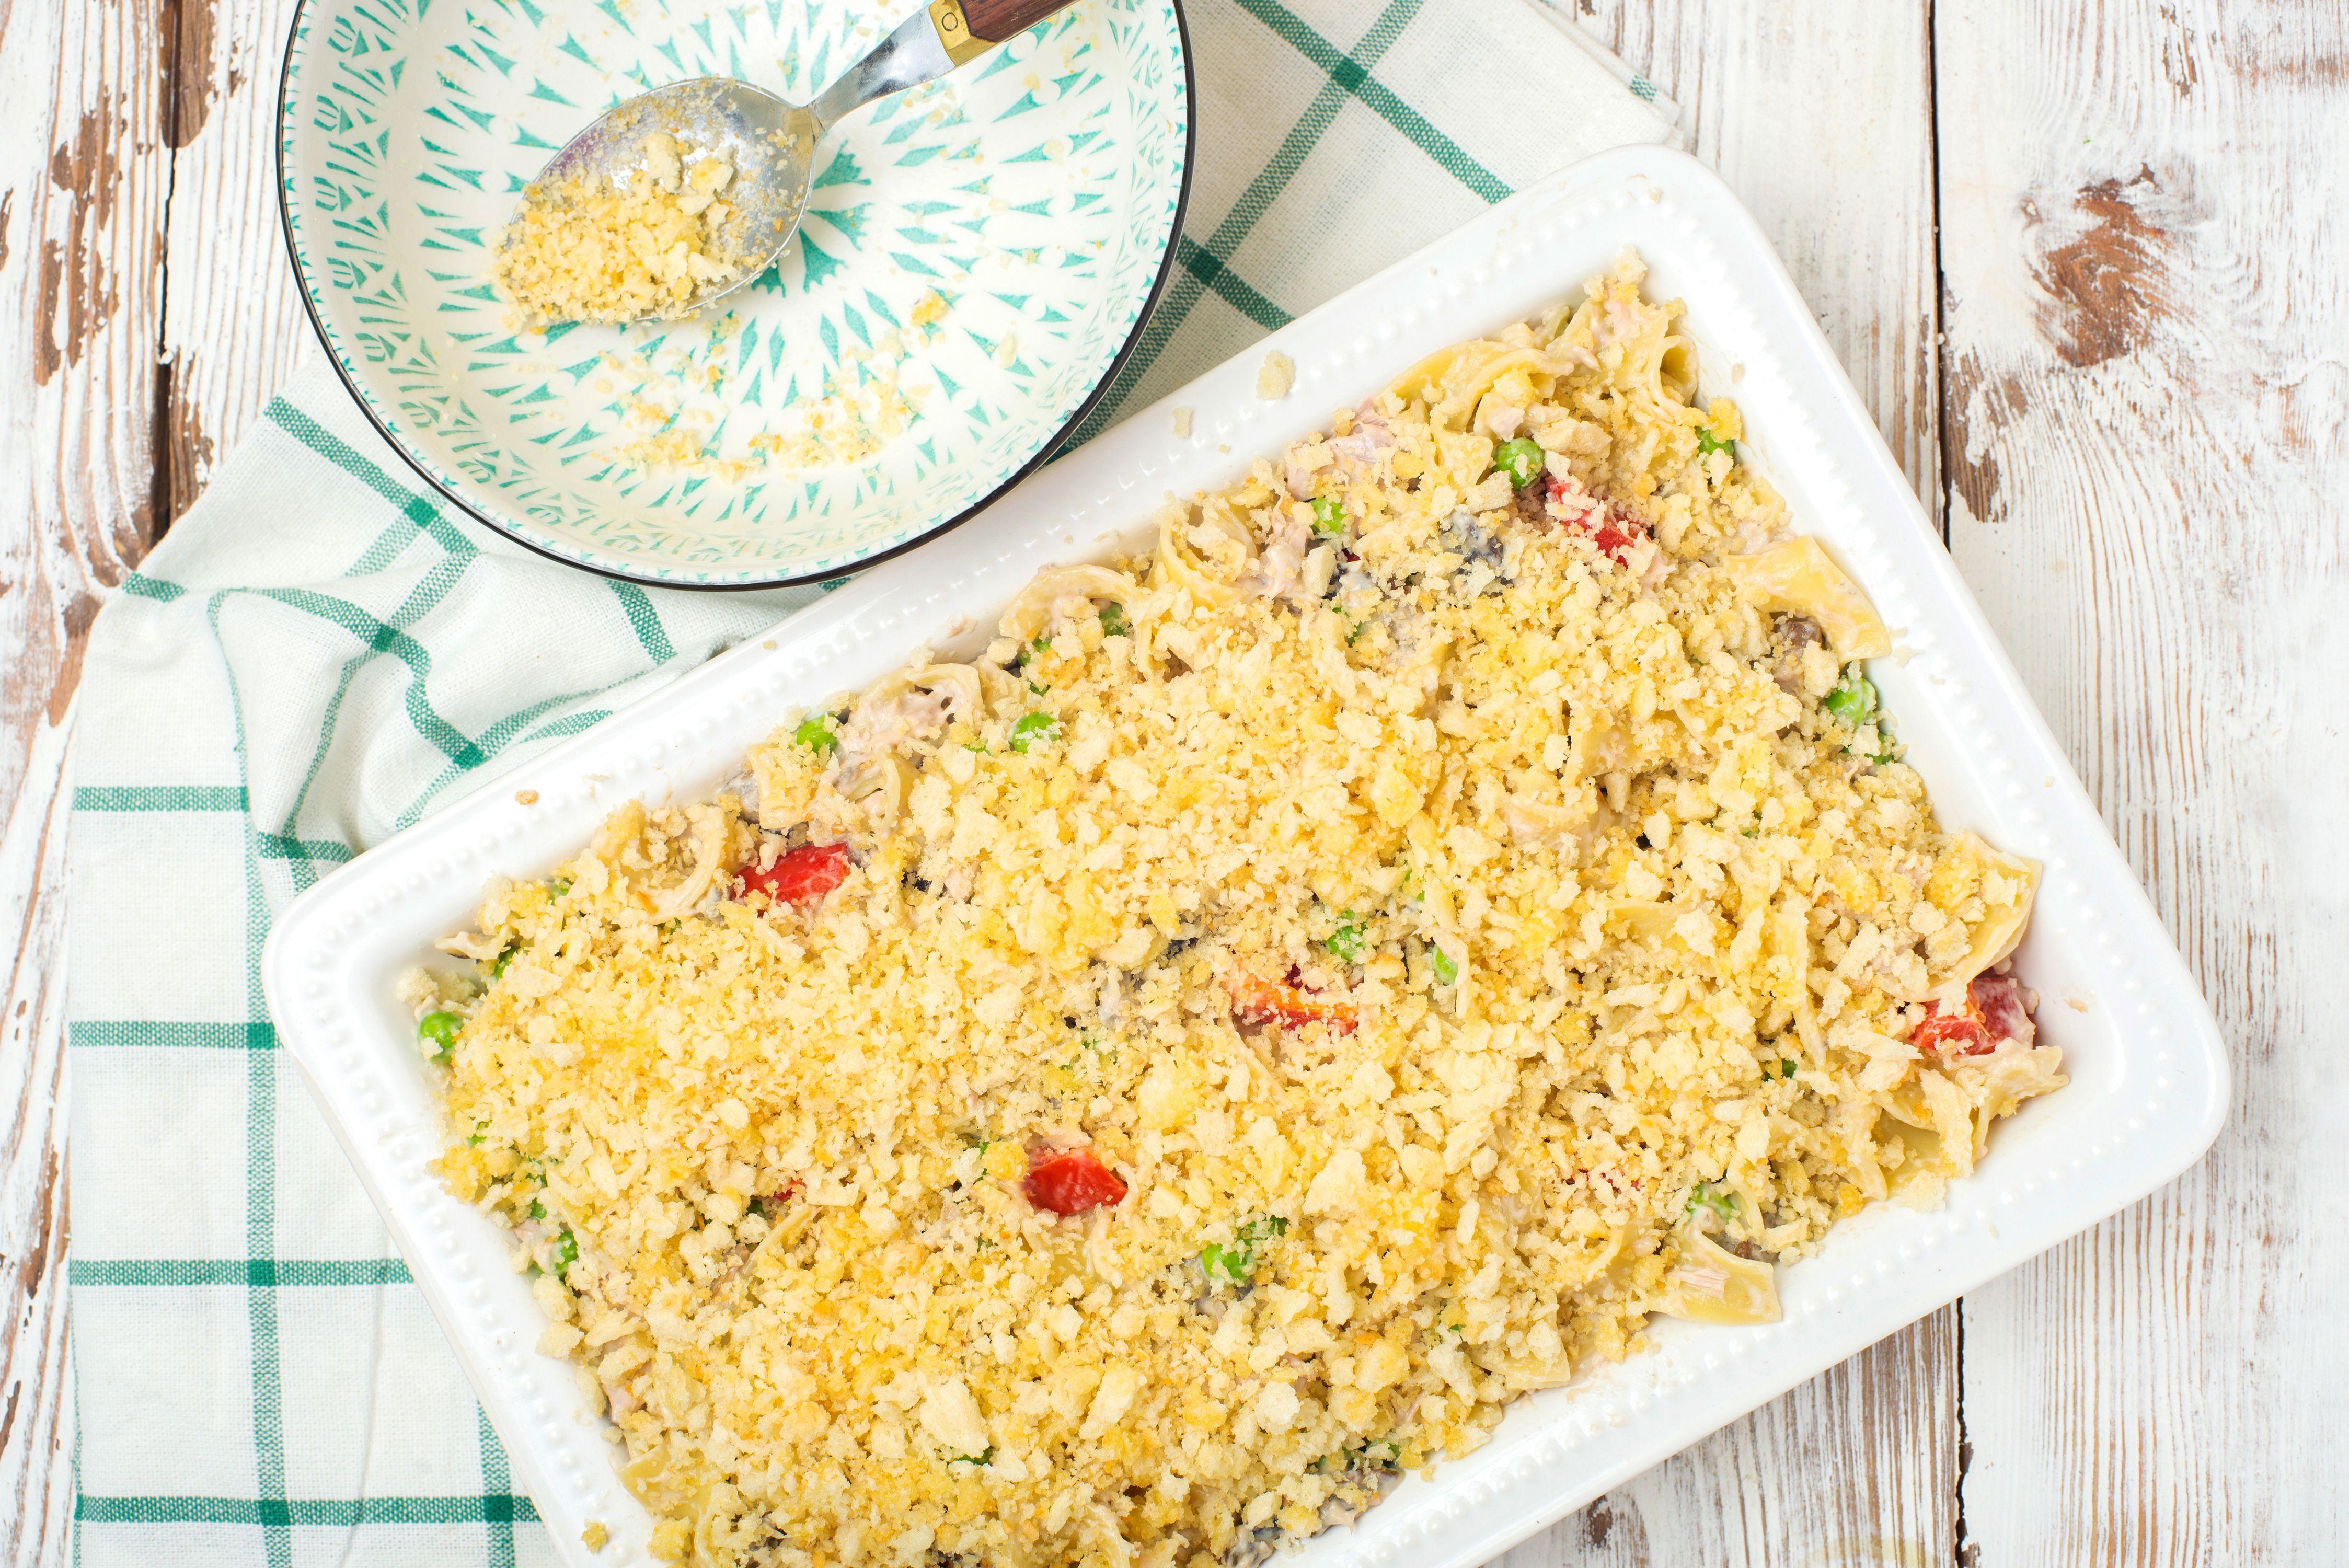 Cover tuna casserole with breadcrumbs